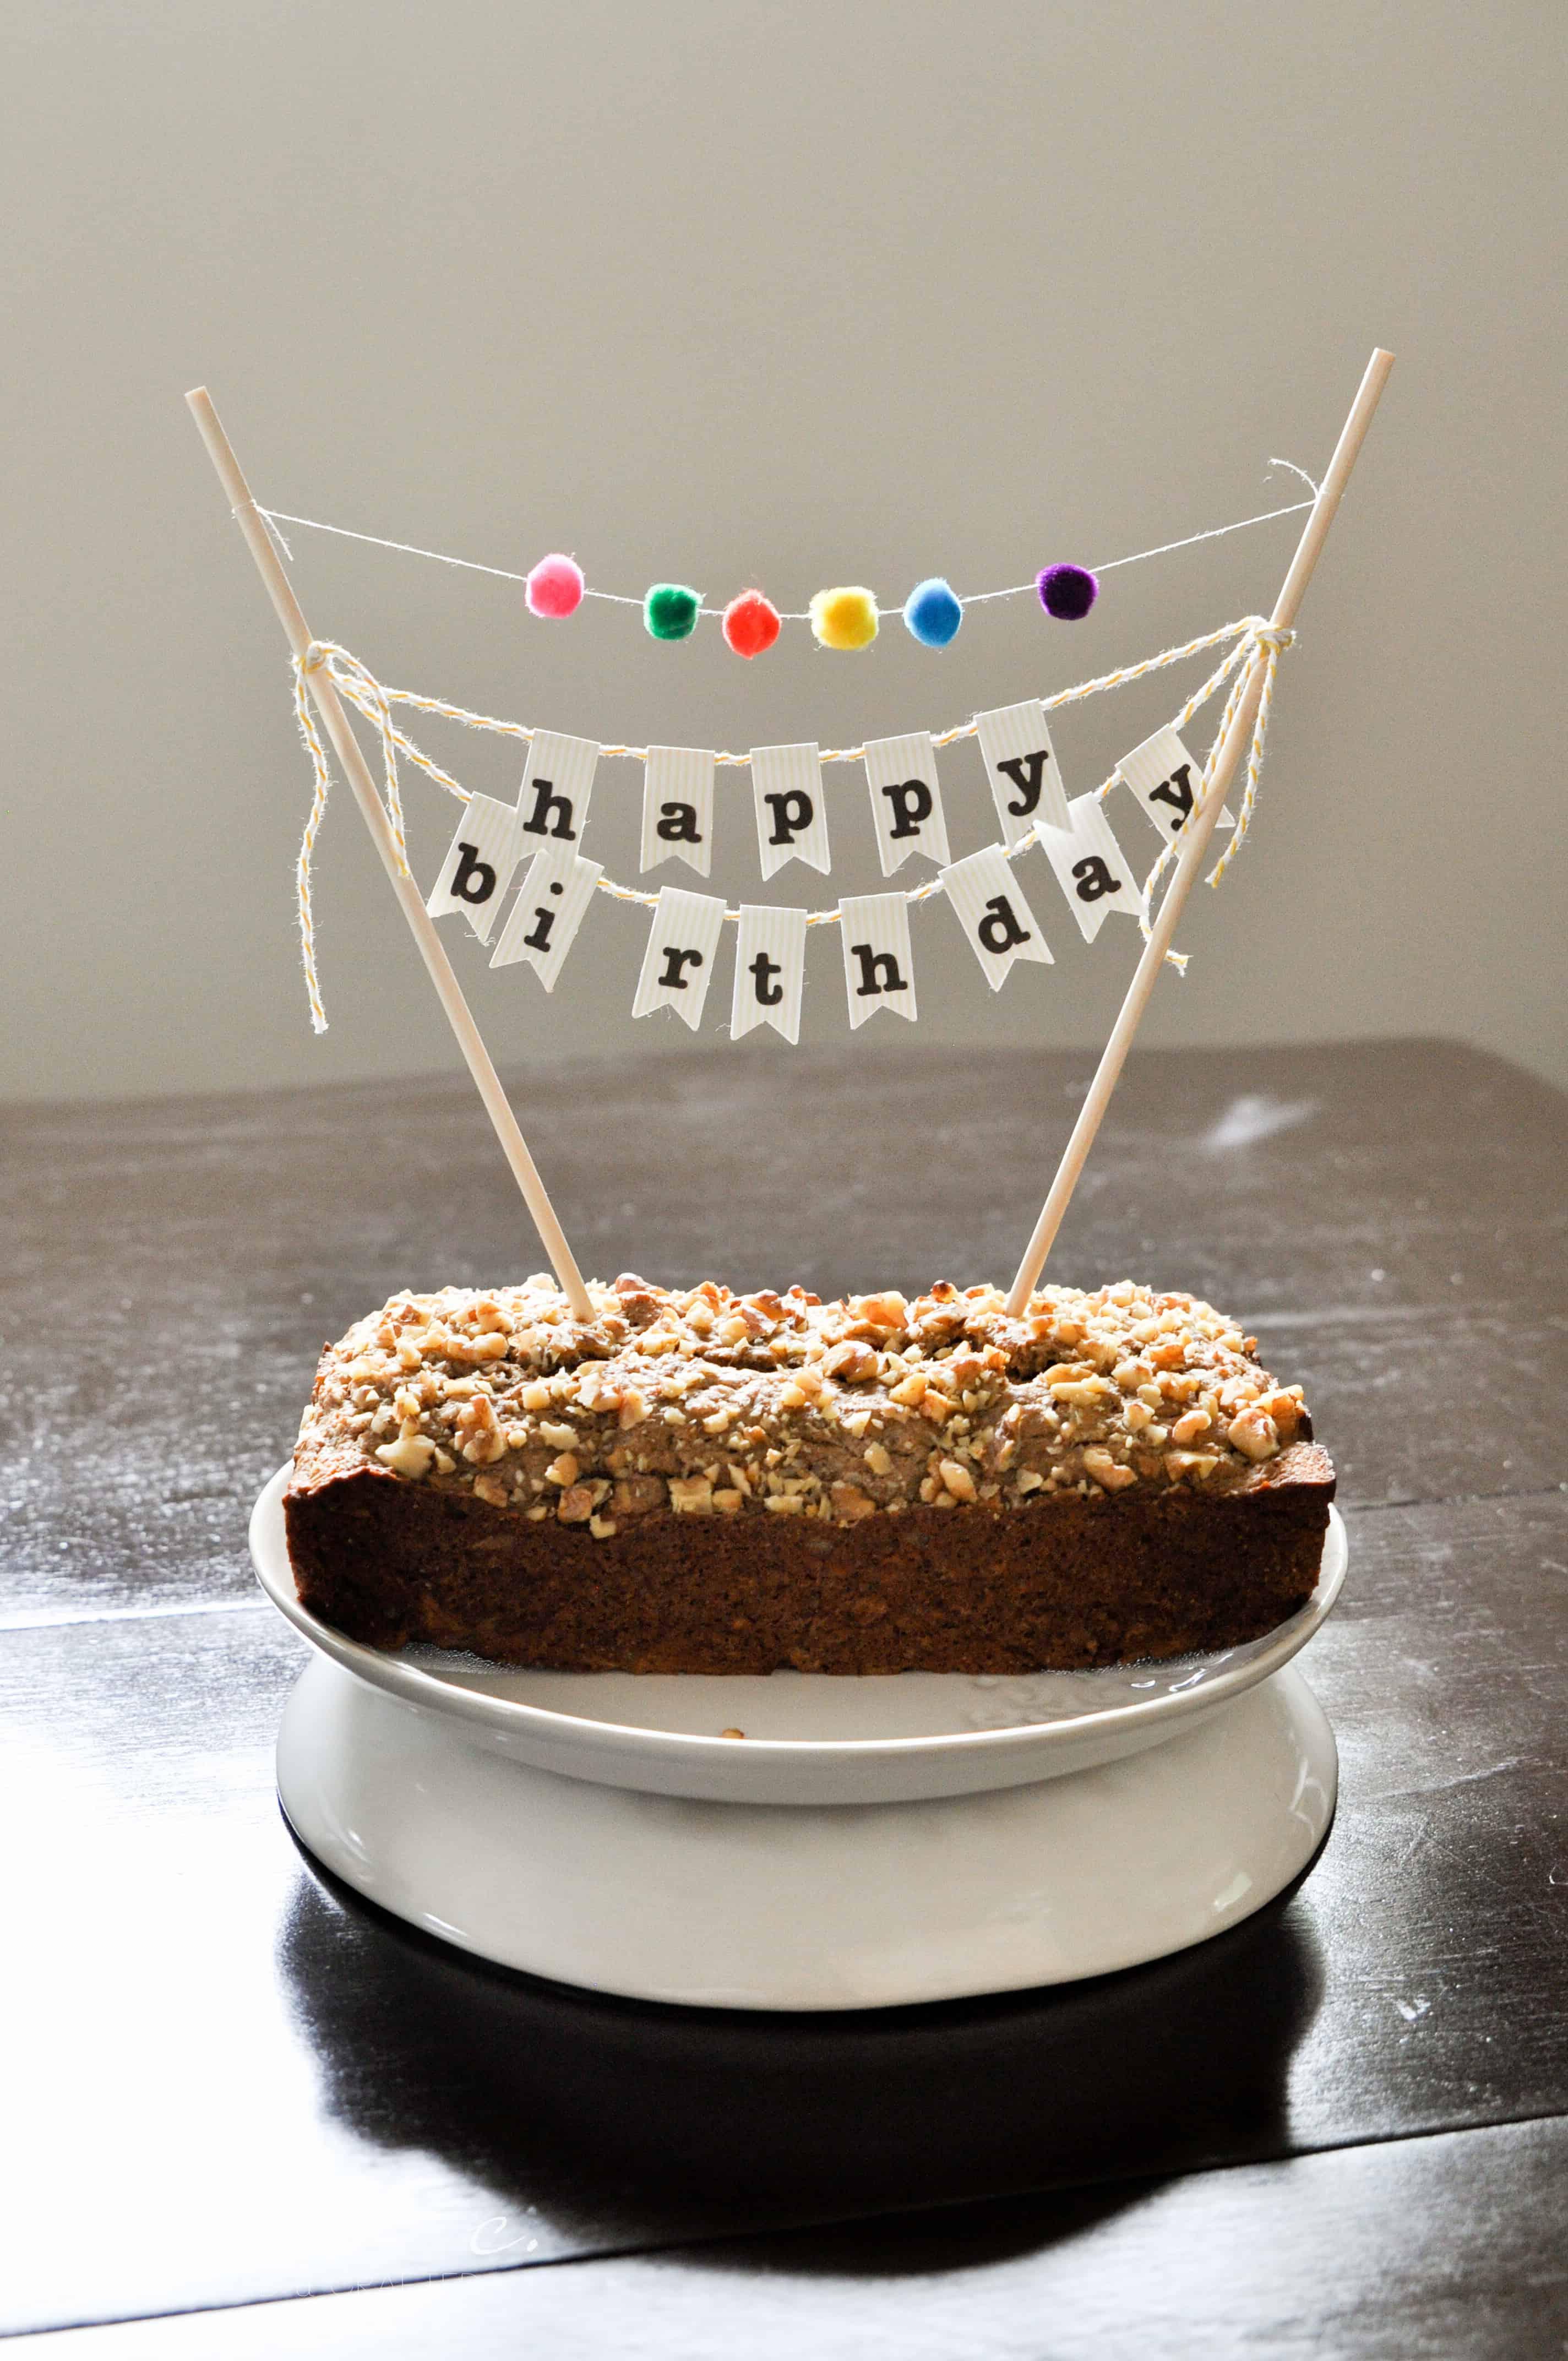 diy birthday cake banner with pom